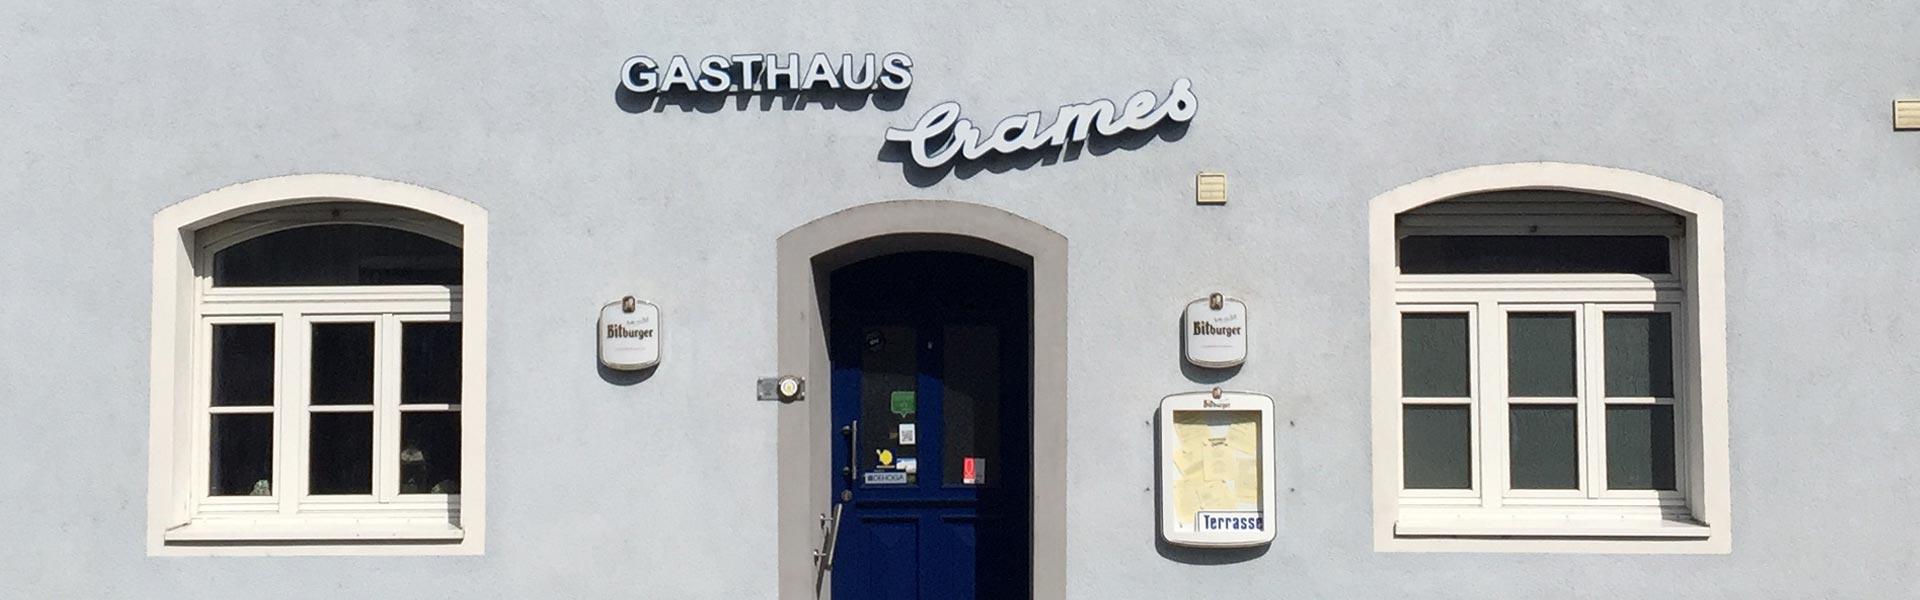 Gasthaus-Crames Haus